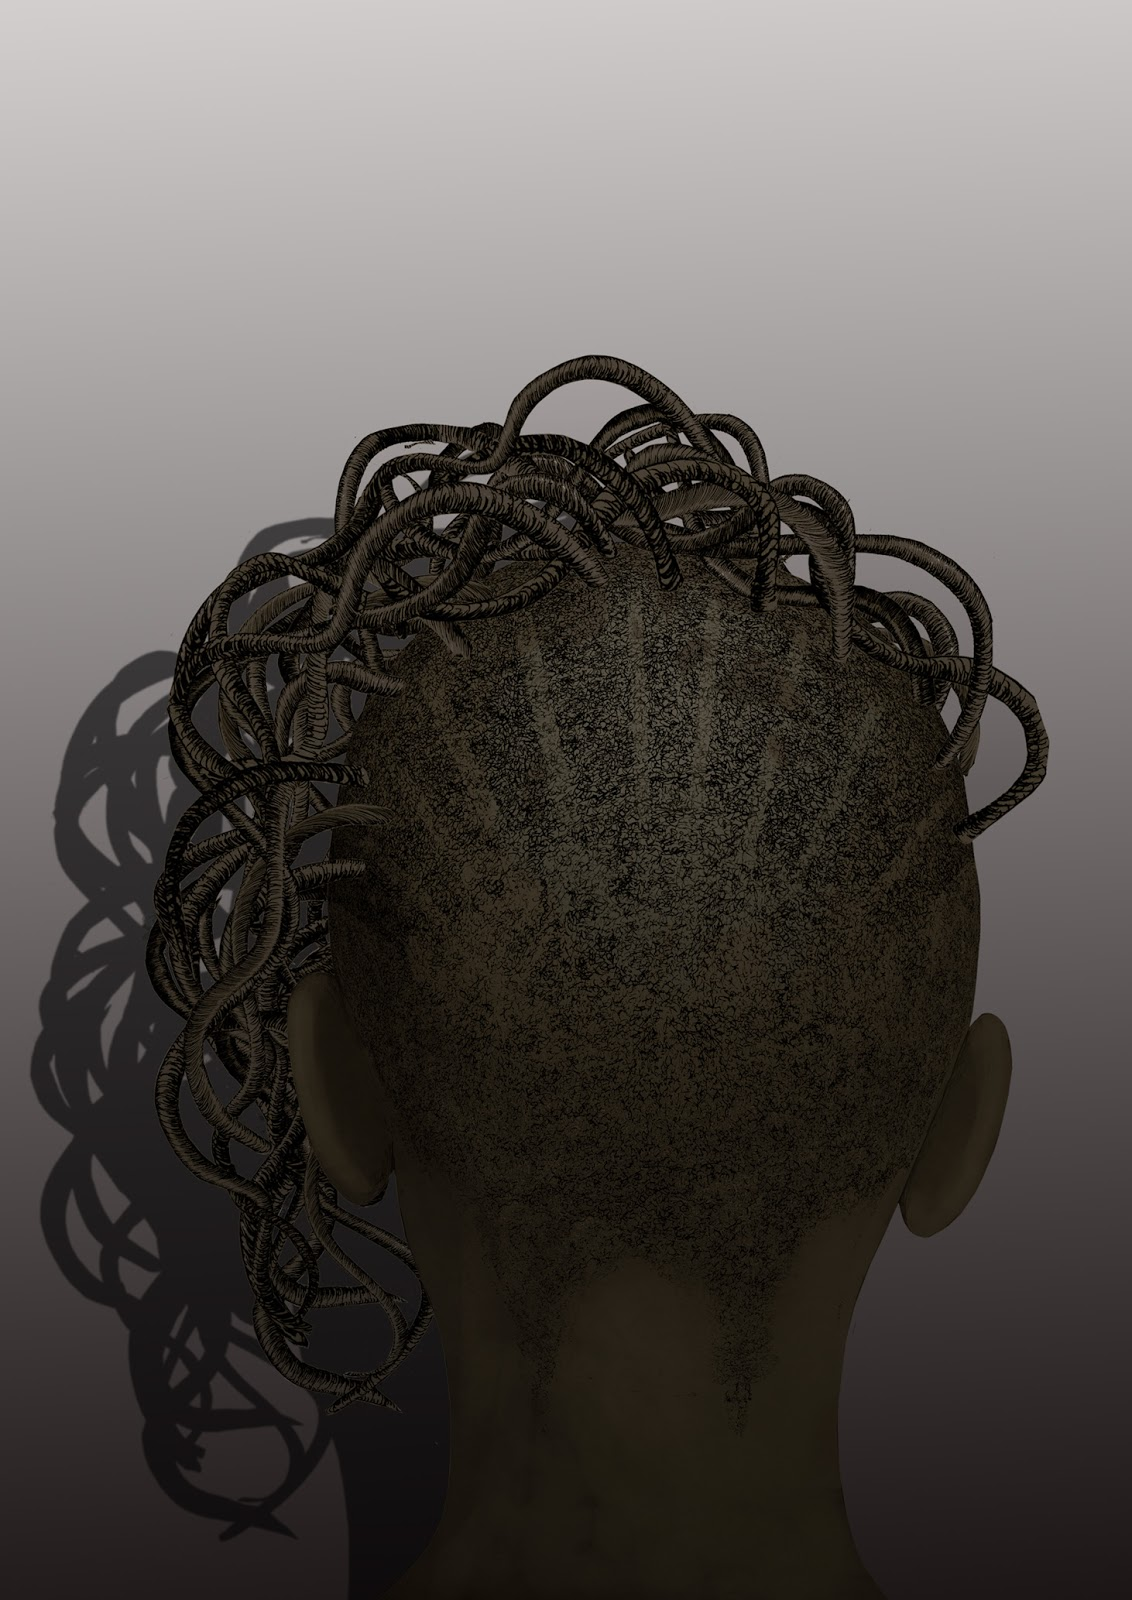 Peinado africano, dibujo